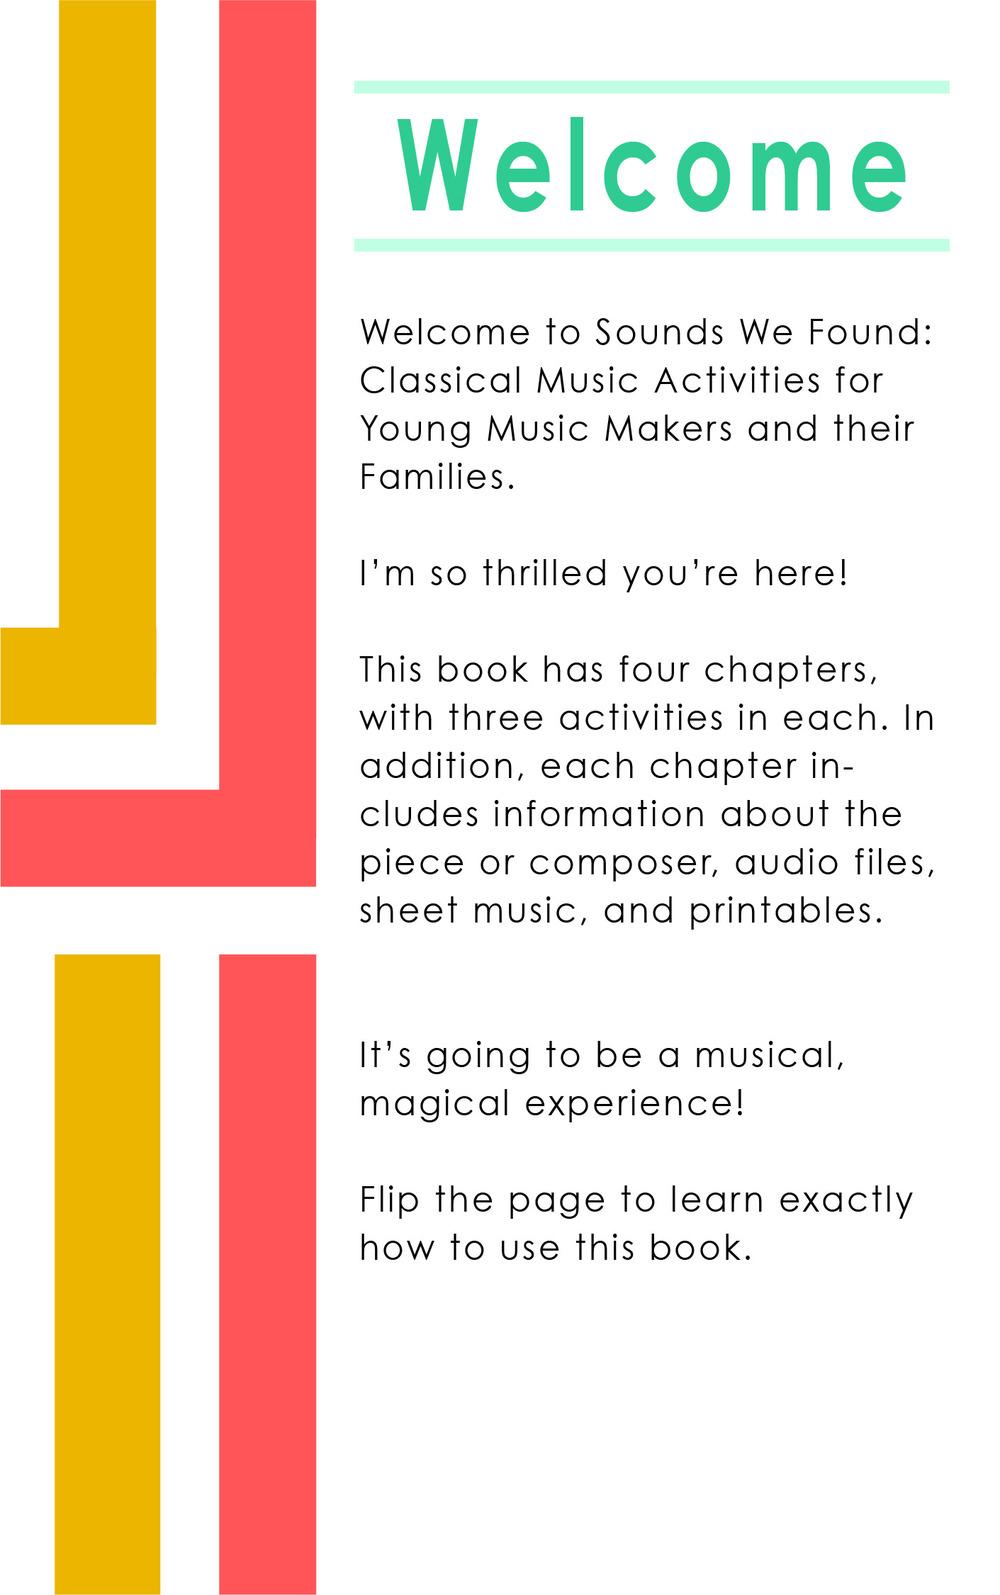 Sounds We Found JPG _Welcome.jpg